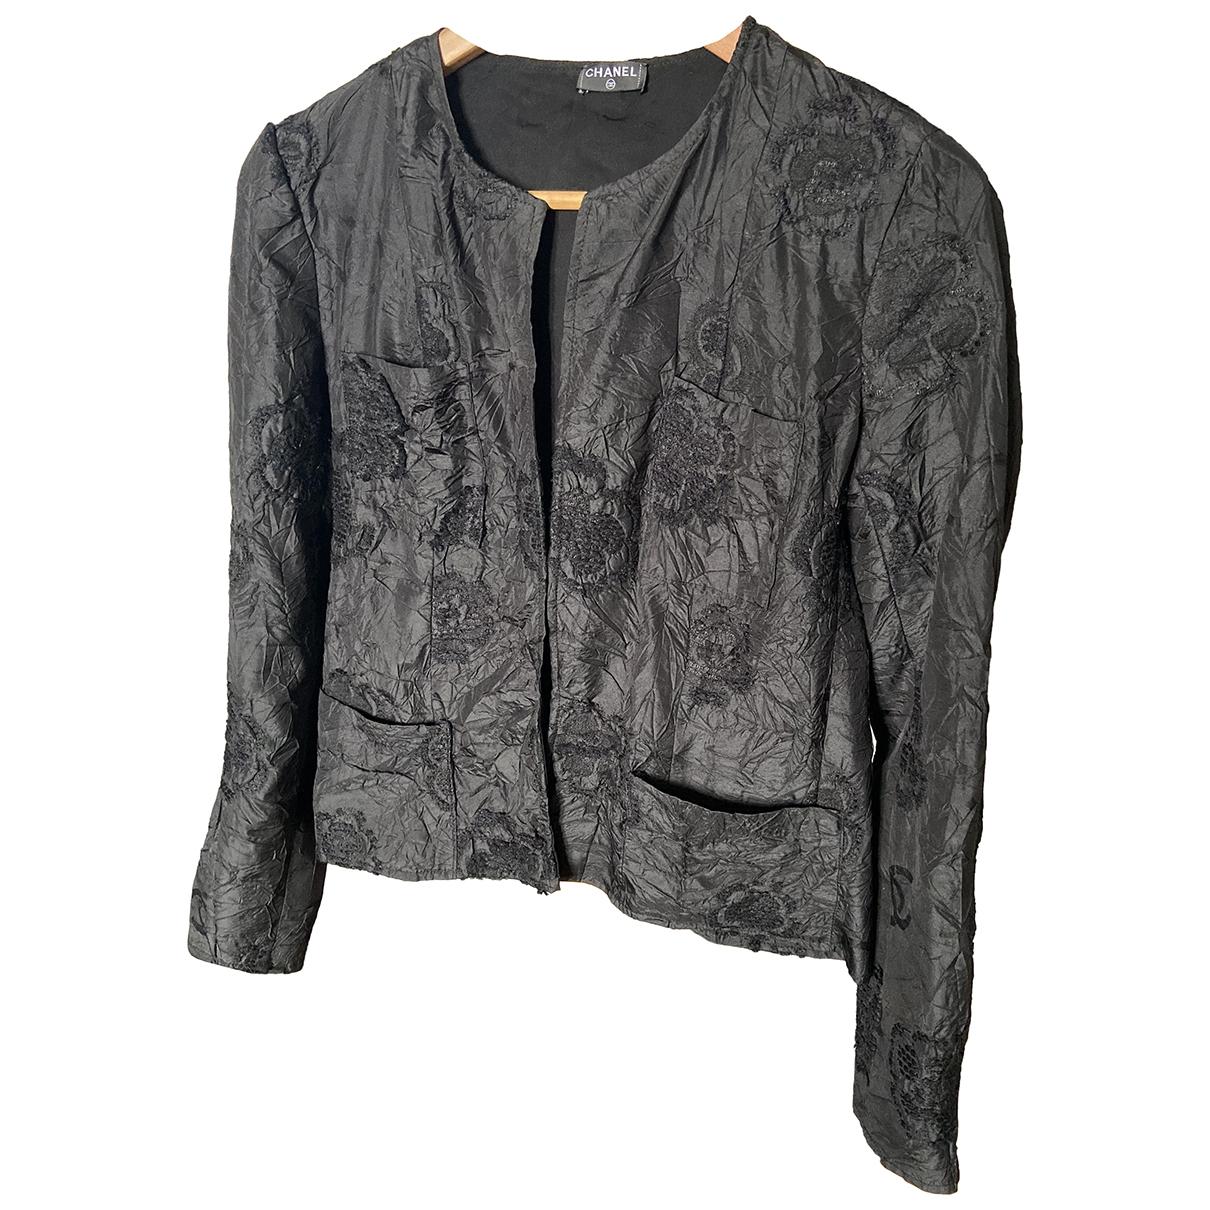 Chanel \N Jacke in  Schwarz Polyester